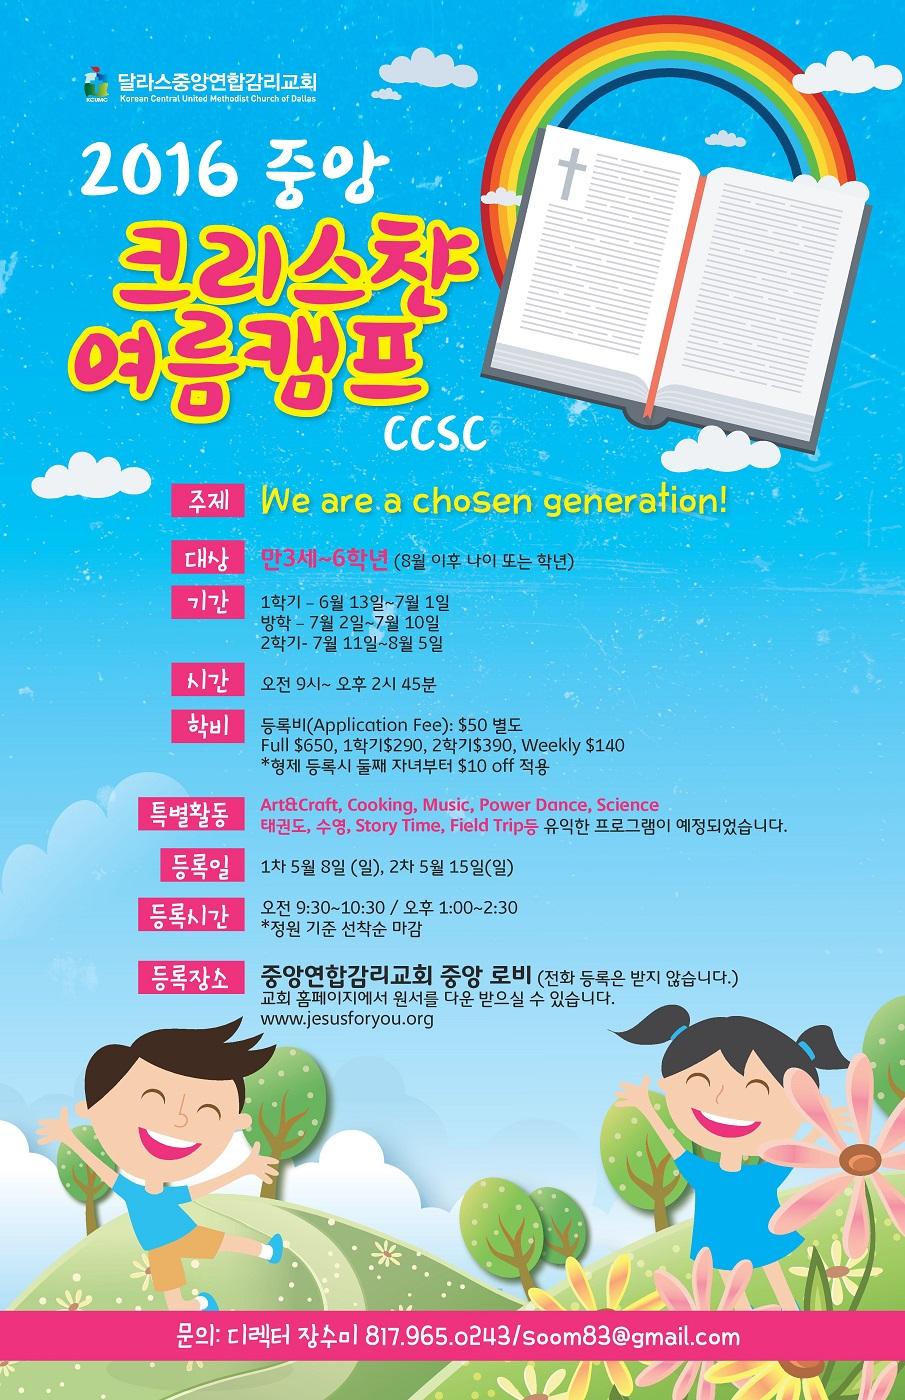 ccsc-page-001